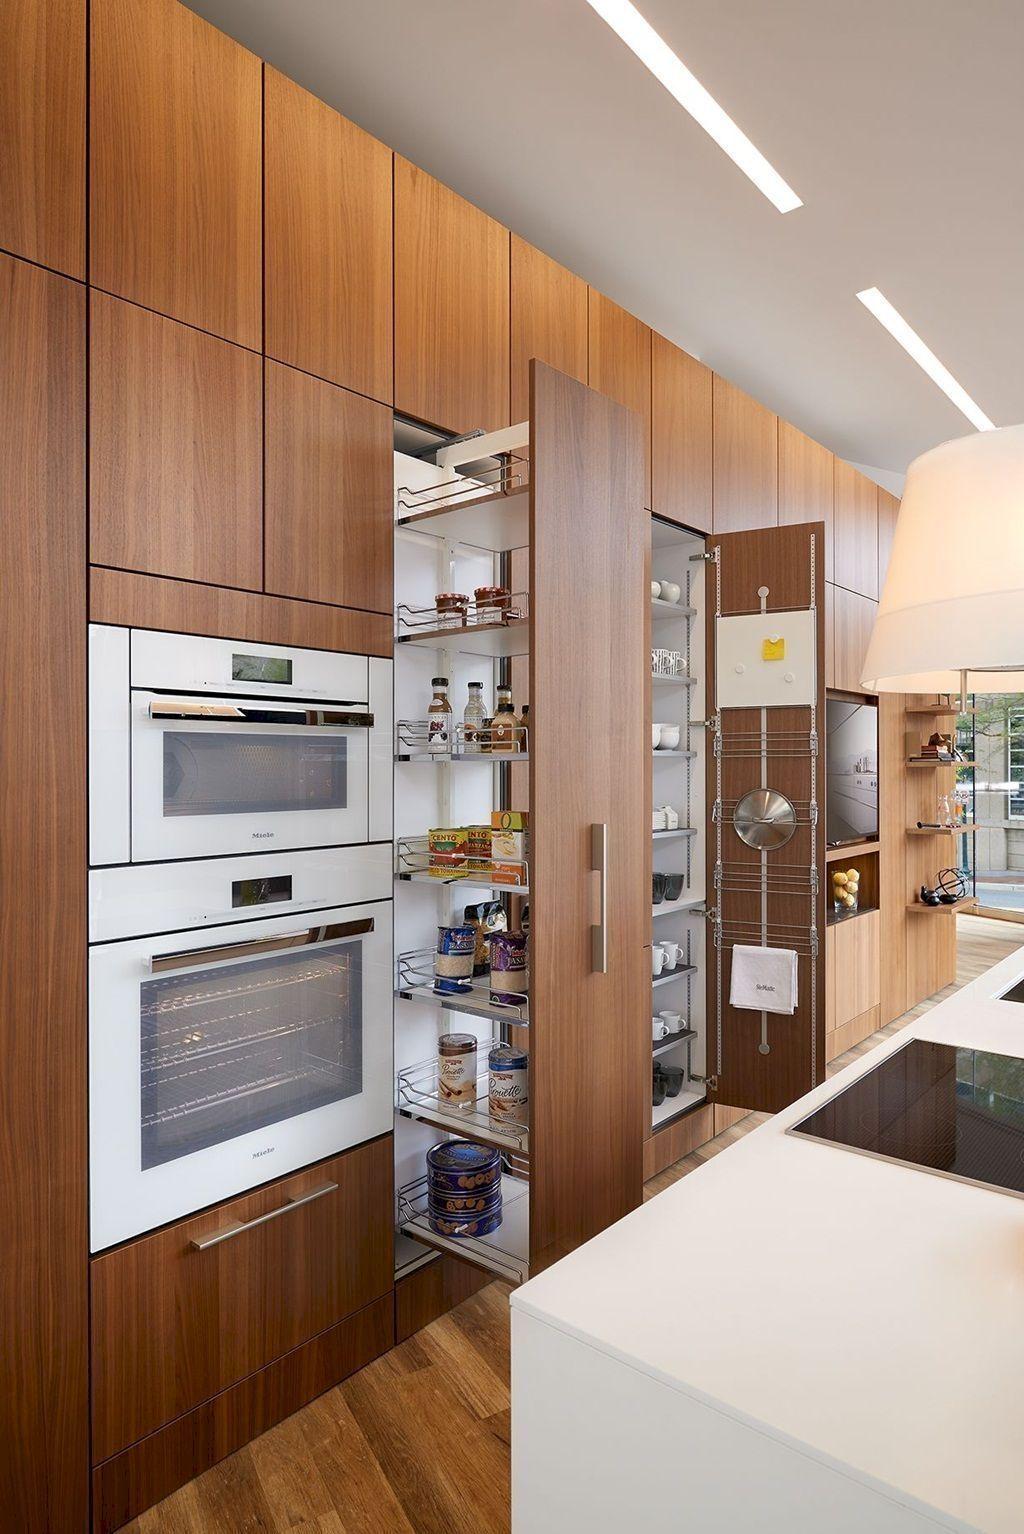 Exquisite Kitchen Cupboard Concepts Exquisite Kitchen Cupboard Concepts Homerissa Save Images Homeri Modern Kitchen Diy Kitchen Cabinets Kitchen Cabinet Design